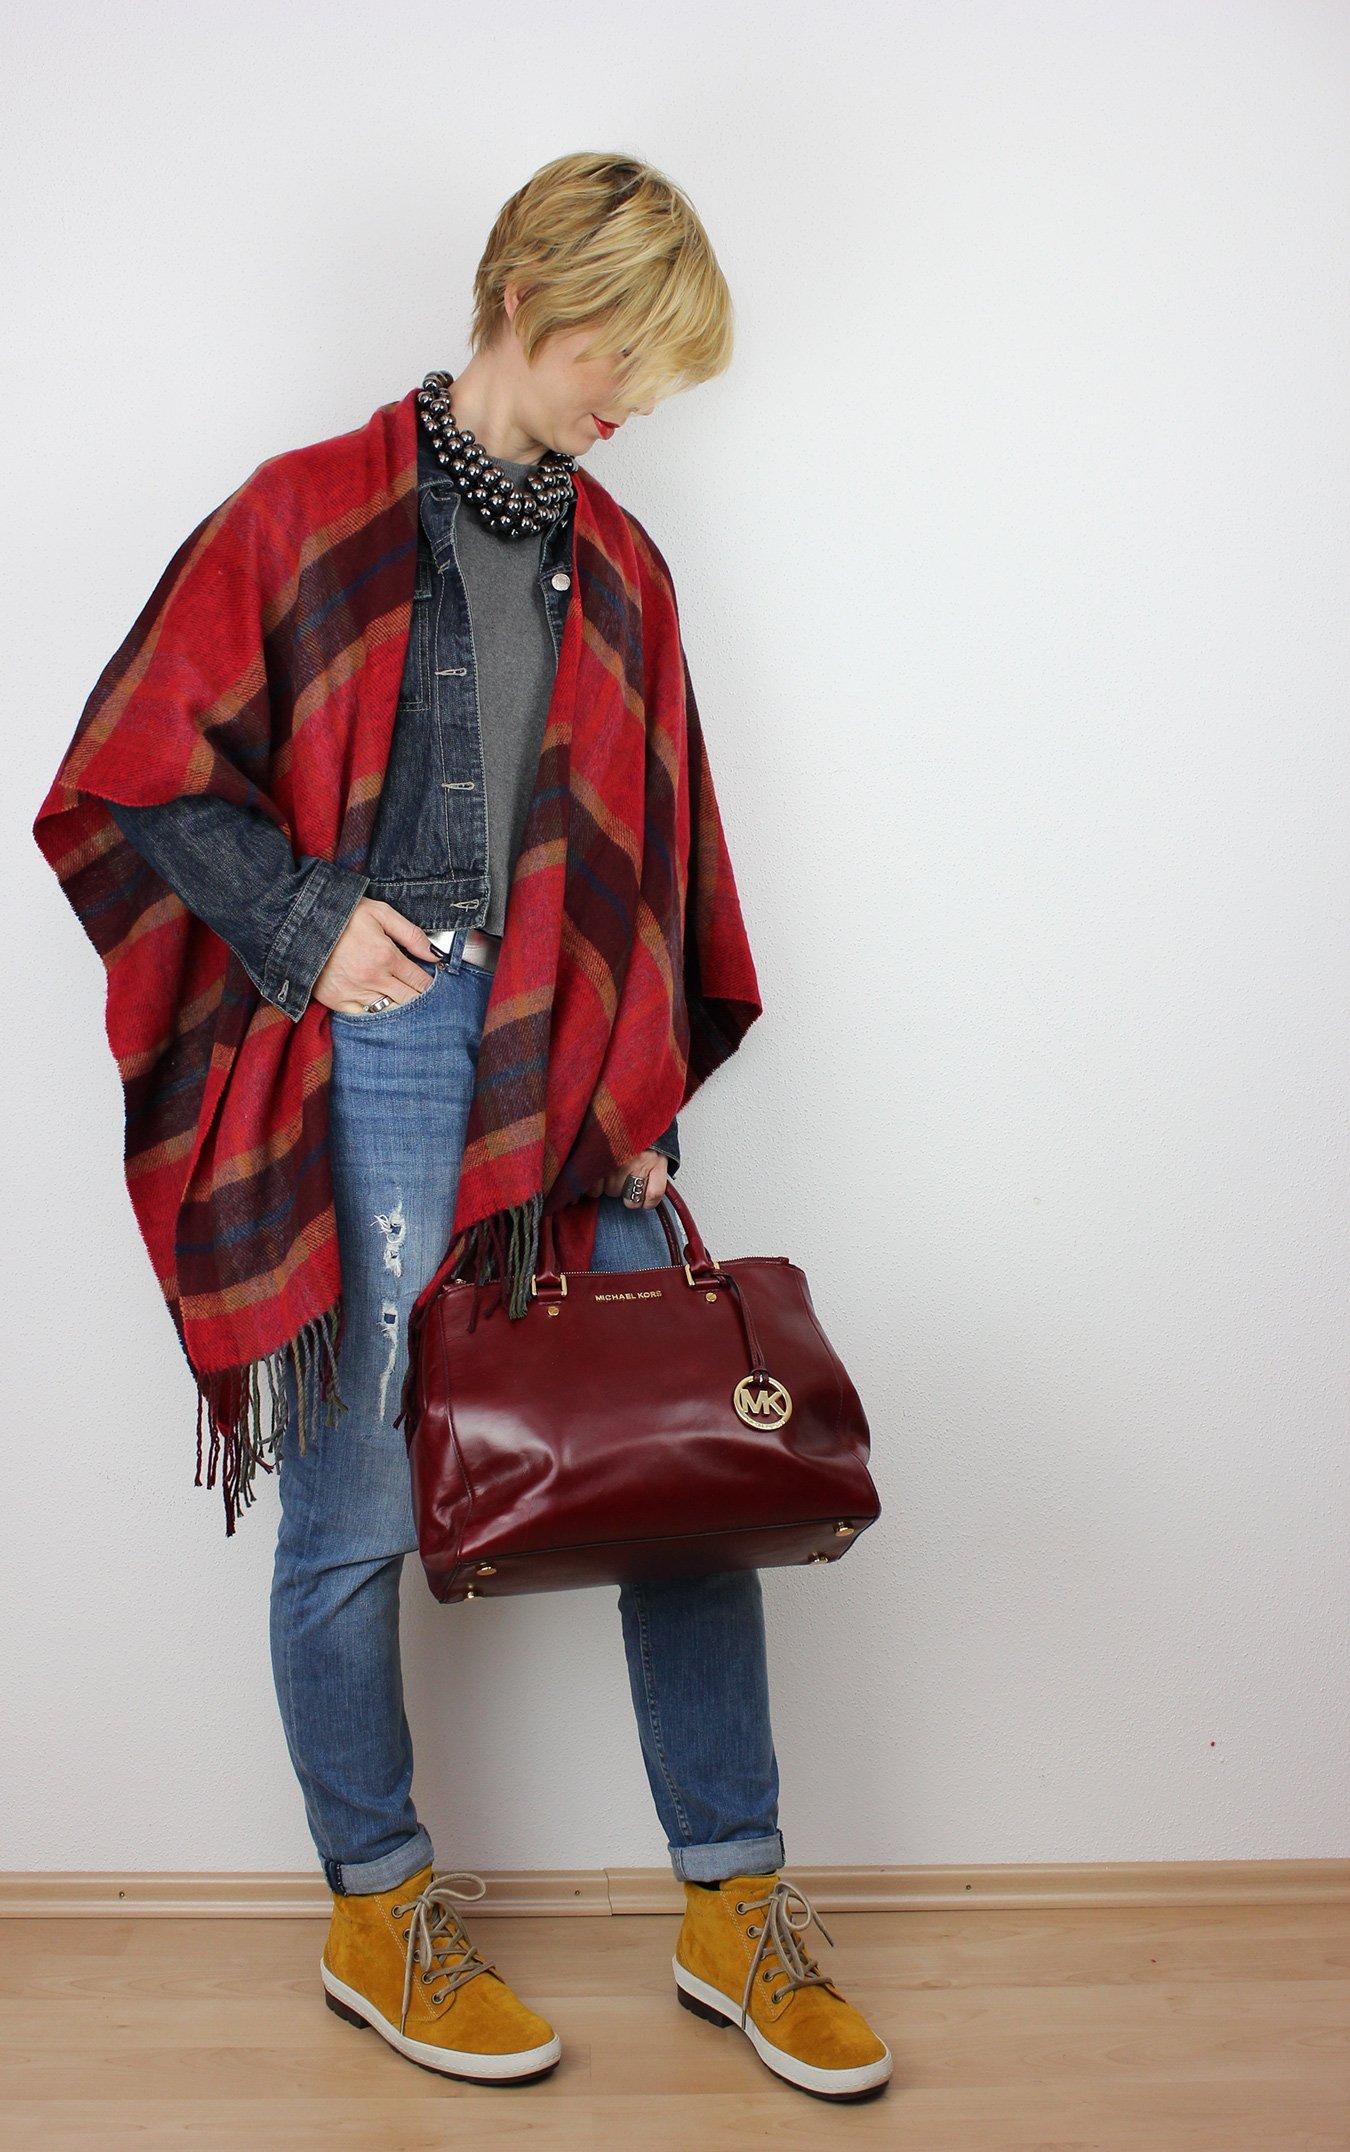 IMG_3193a_OversizedScarf_BoyfriendJeans_Cape_rot_senfgelb_MichaelKors